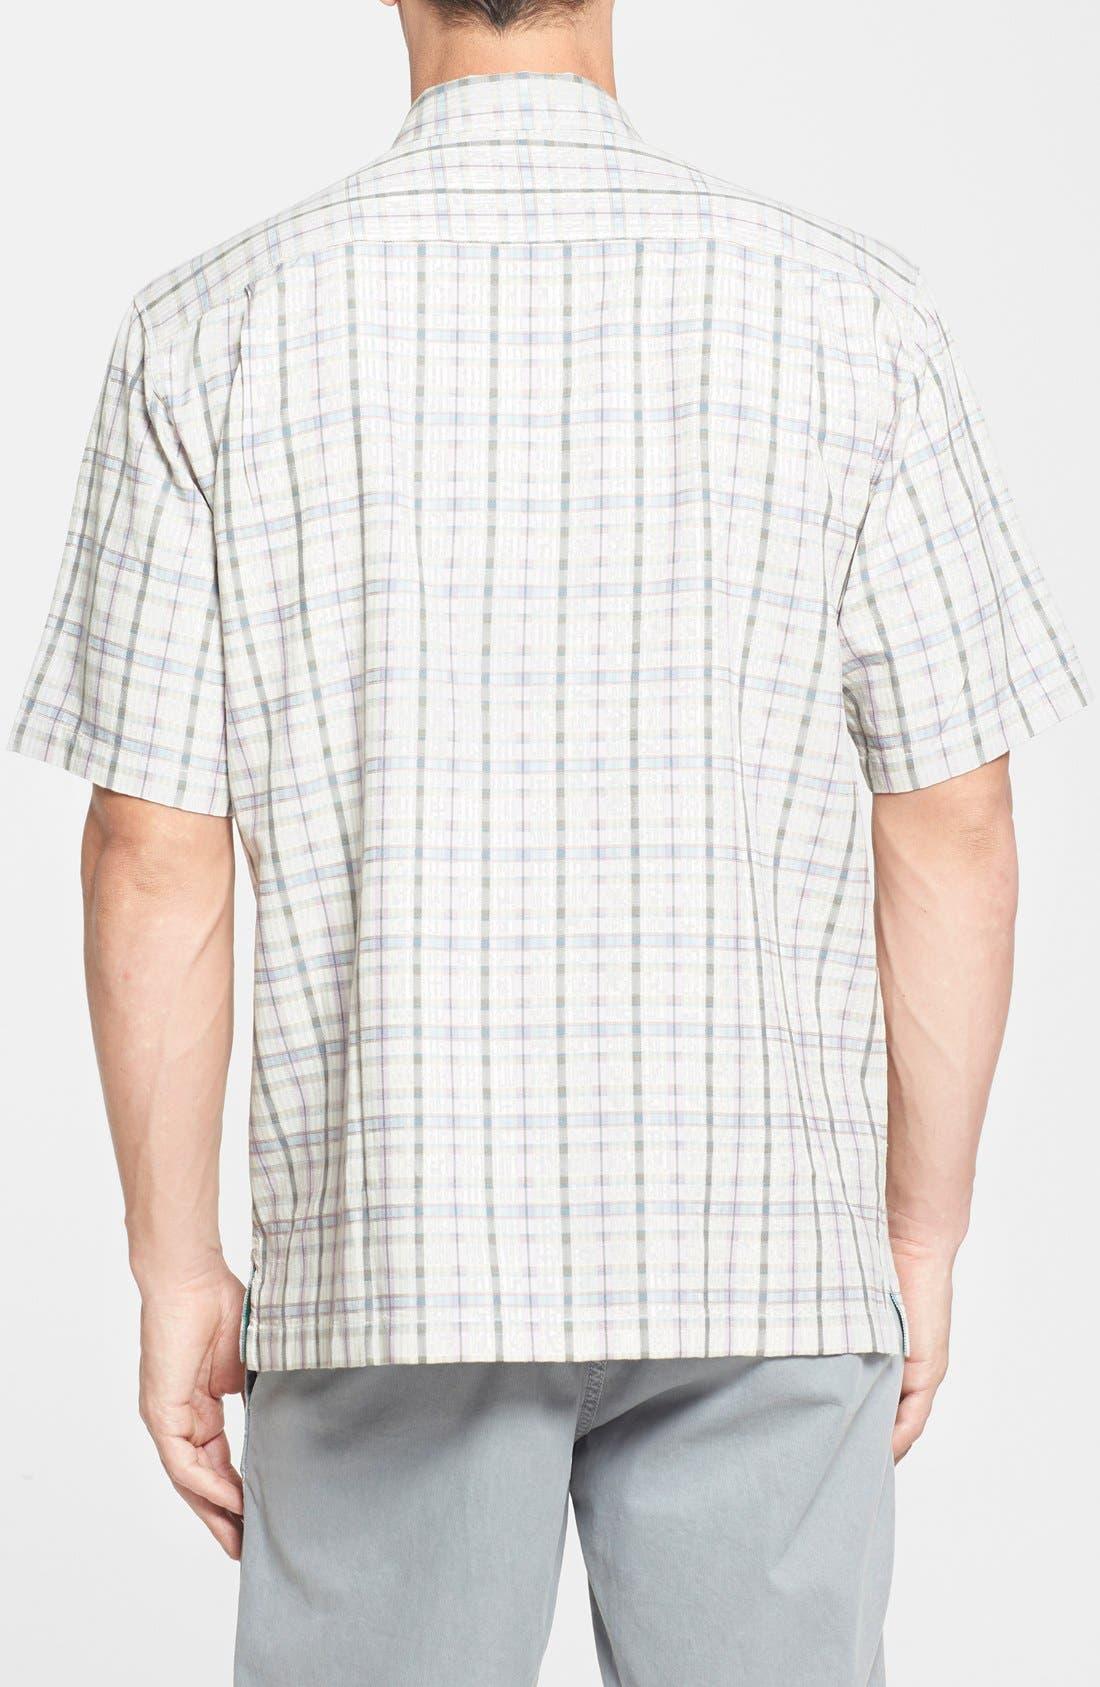 Alternate Image 2  - Tommy Bahama 'Jammin' Plaid' Original Fit Plaid Silk Campshirt